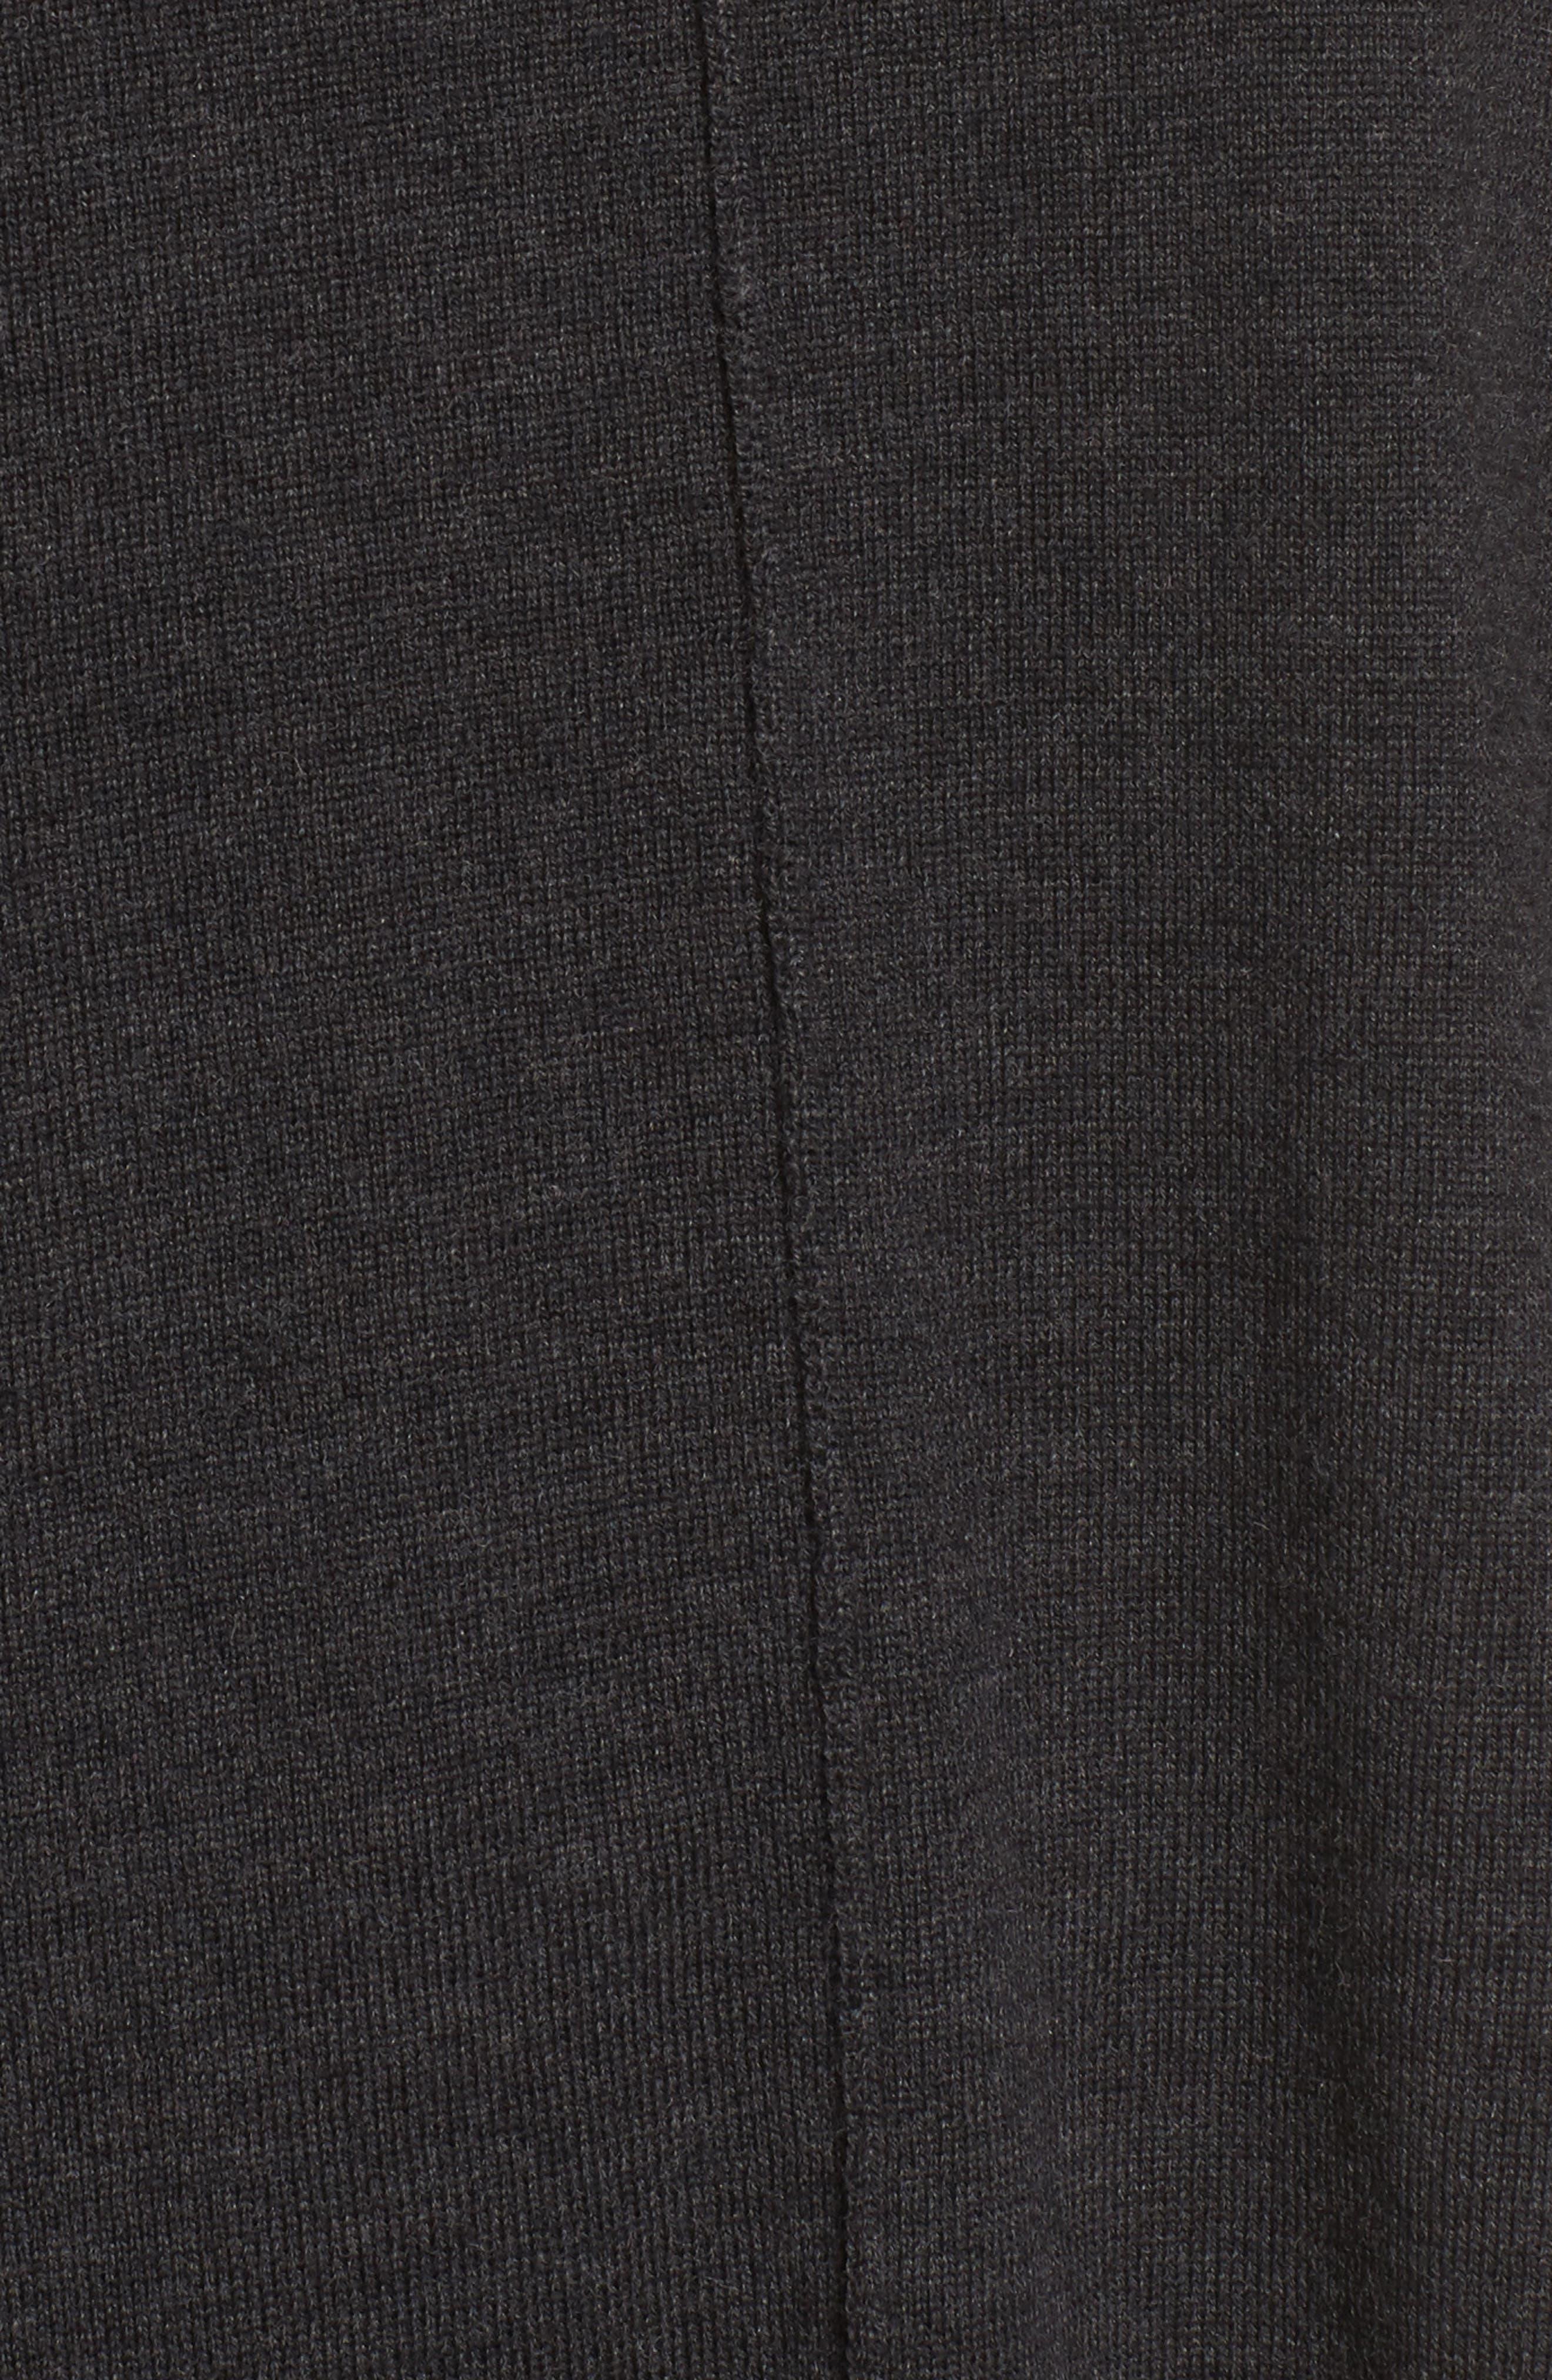 Merino Wool Boxy Turtleneck Sweater,                             Alternate thumbnail 5, color,                             021